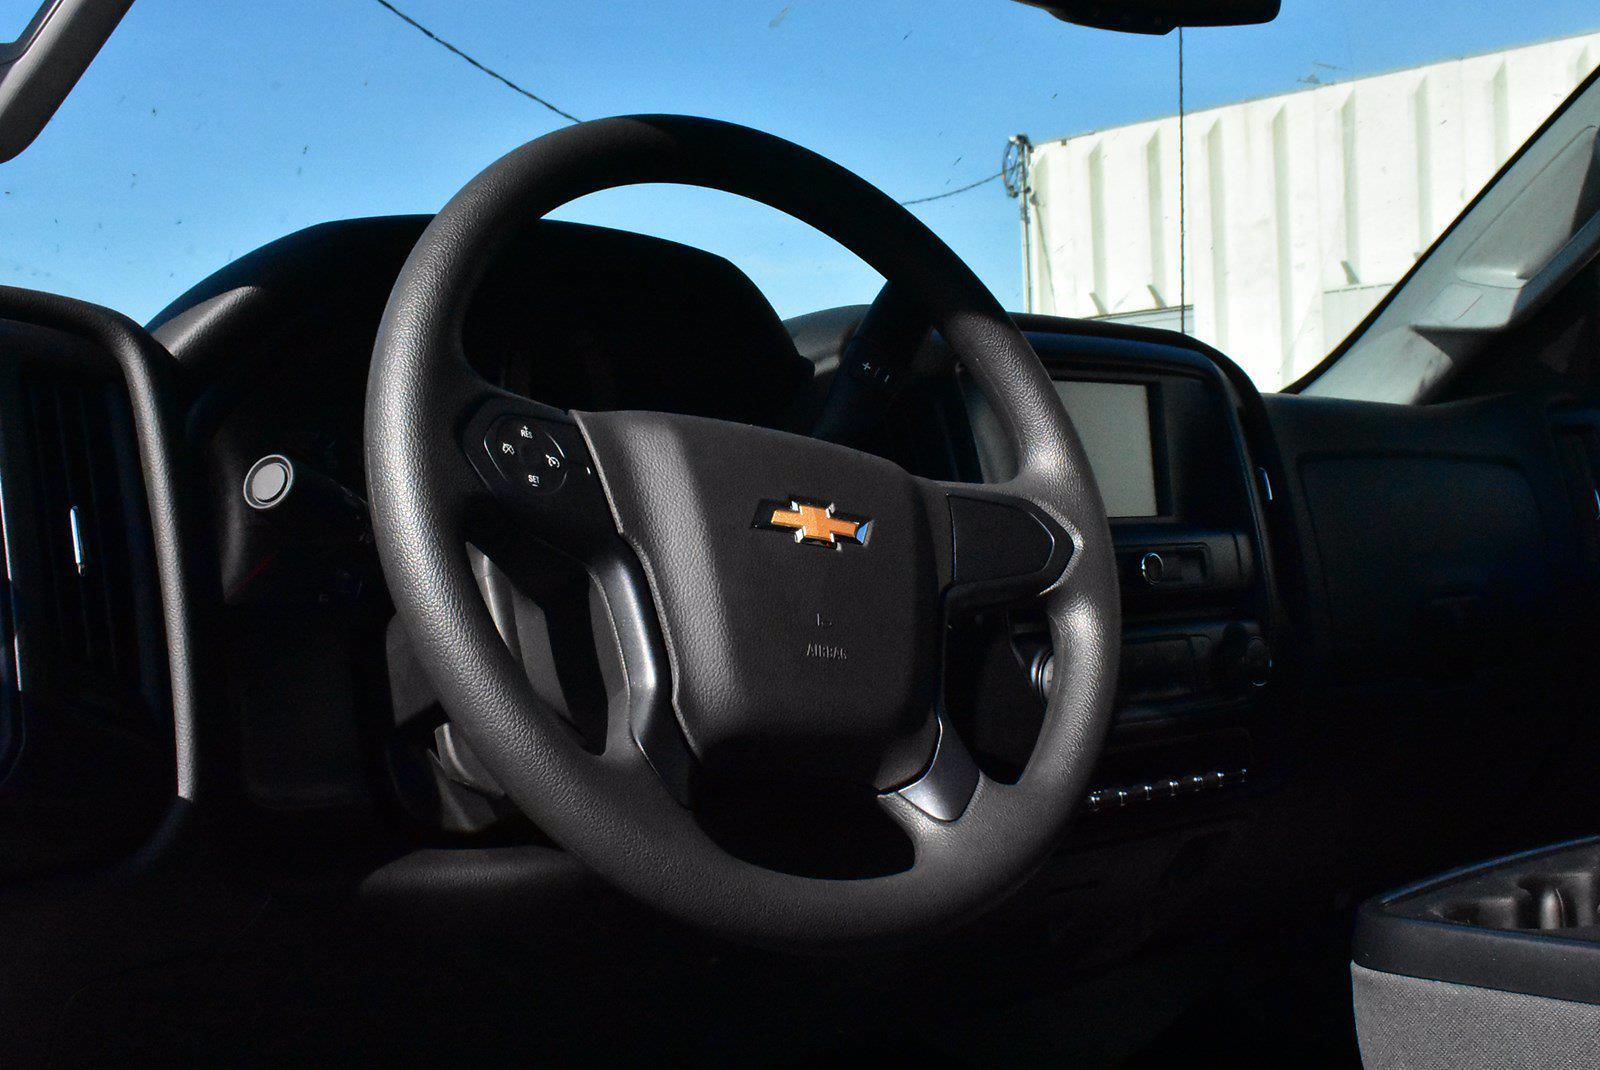 2019 Chevrolet Silverado 6500 DRW 4x4, Cab Chassis #D191433 - photo 6